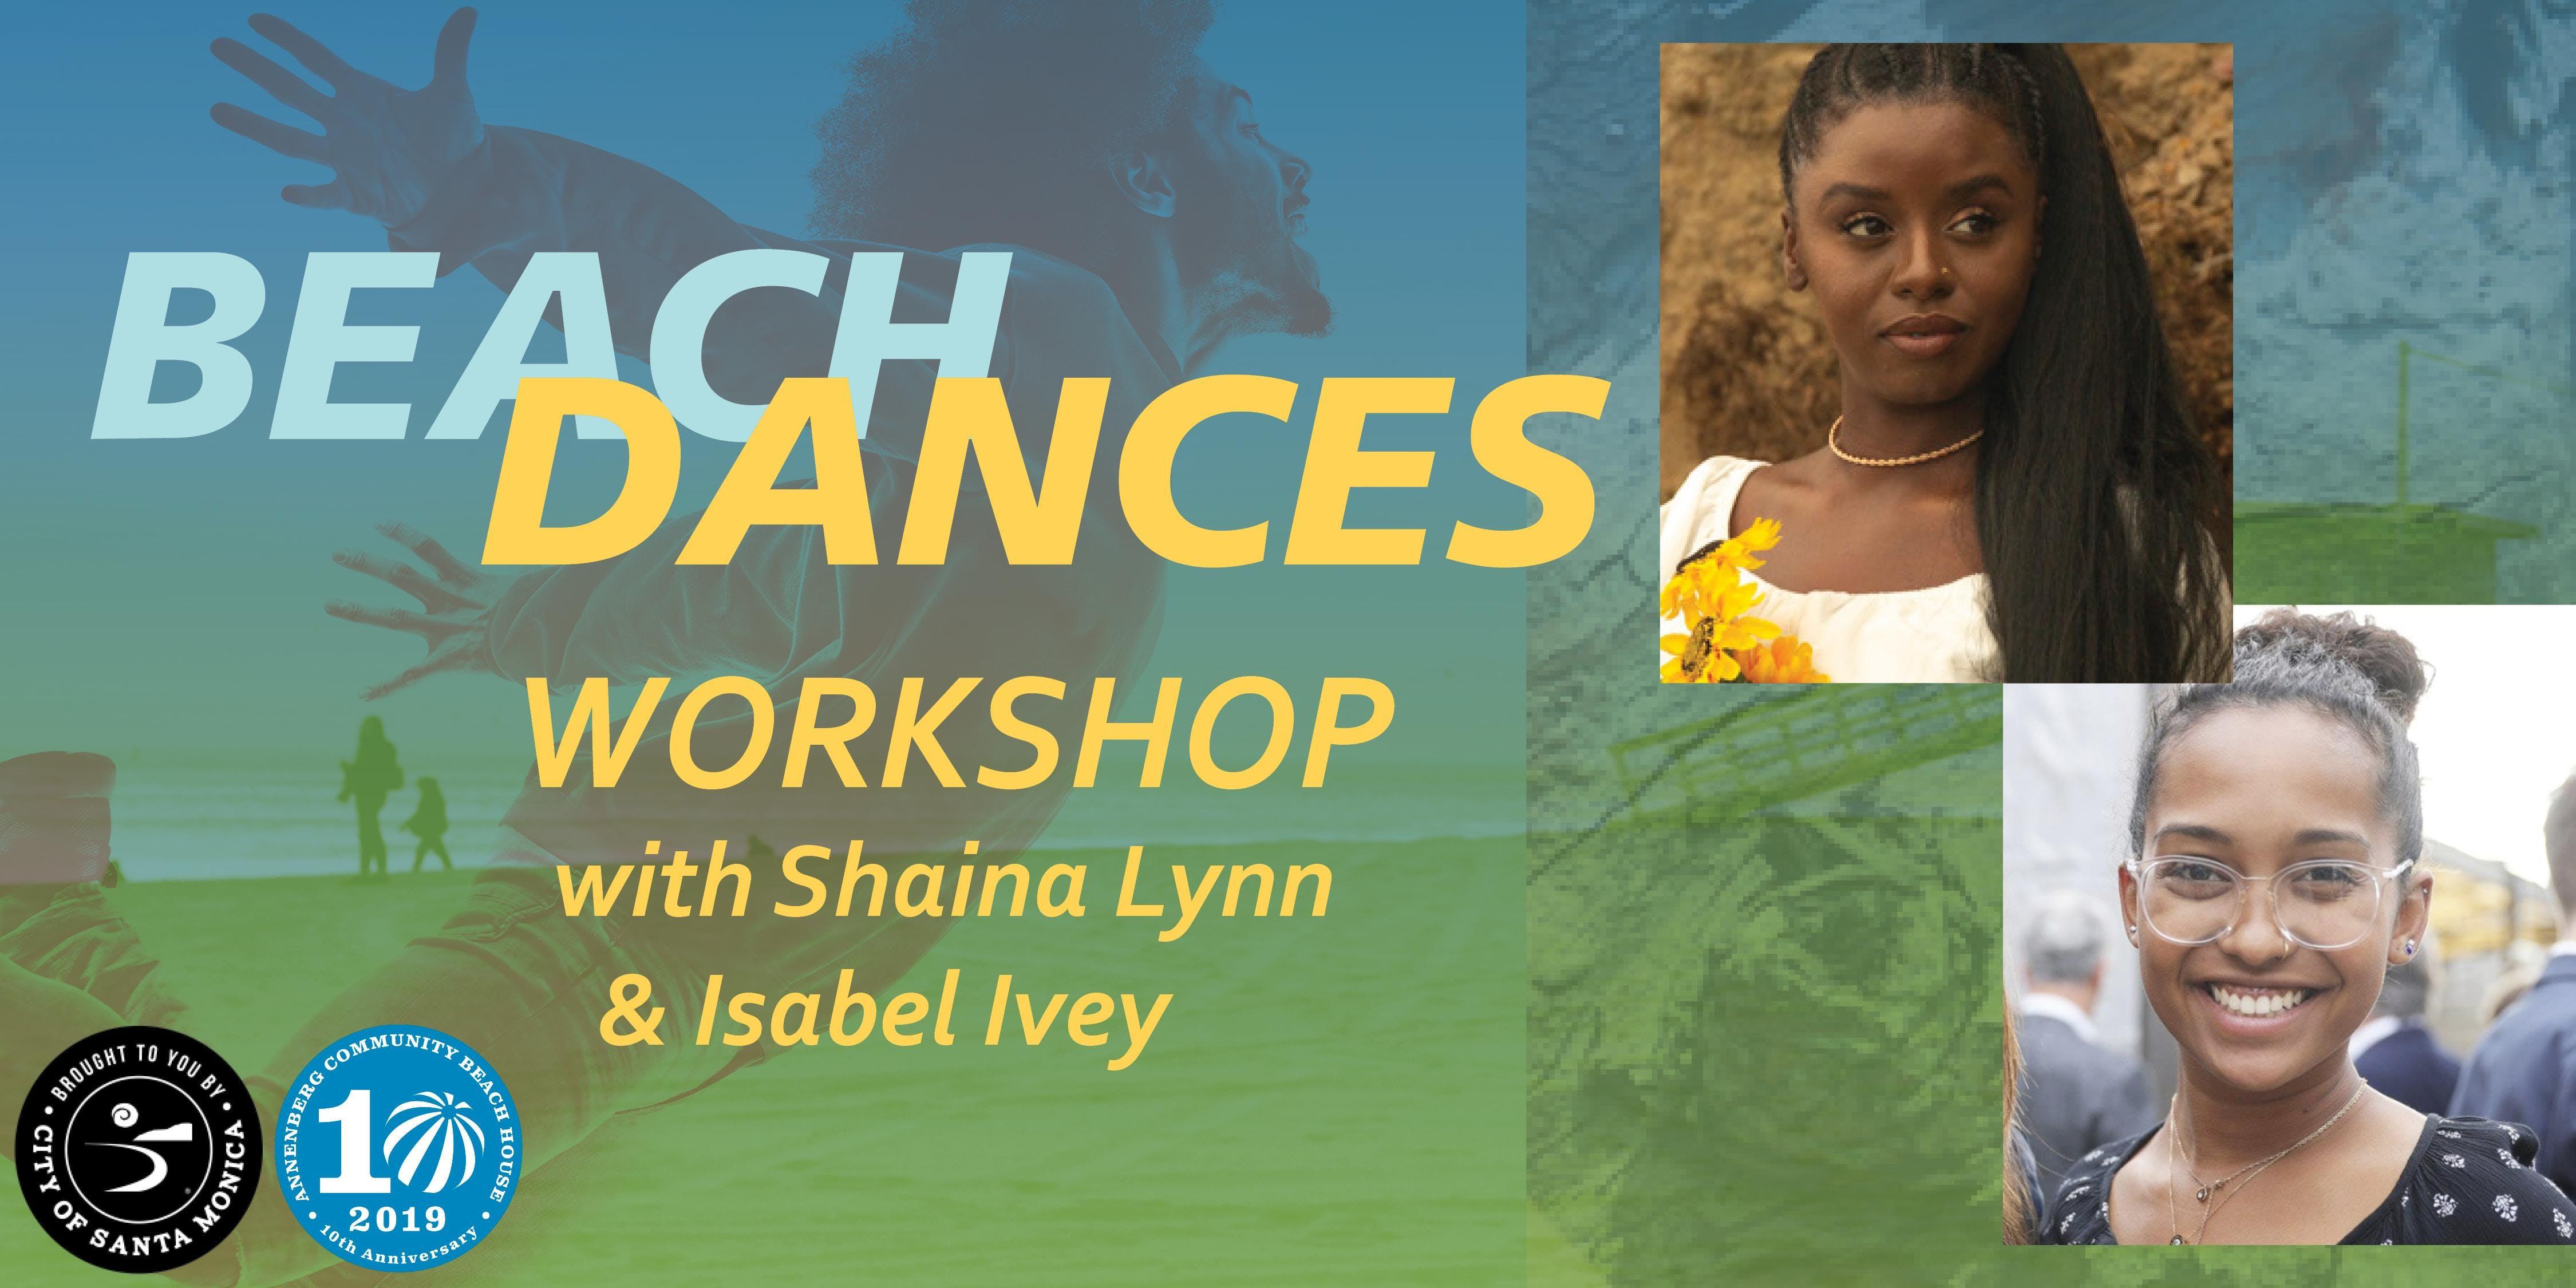 Beach Dances: La Diáspora de Twerk Workshop with Shaina Lynn & Isabel Ivey